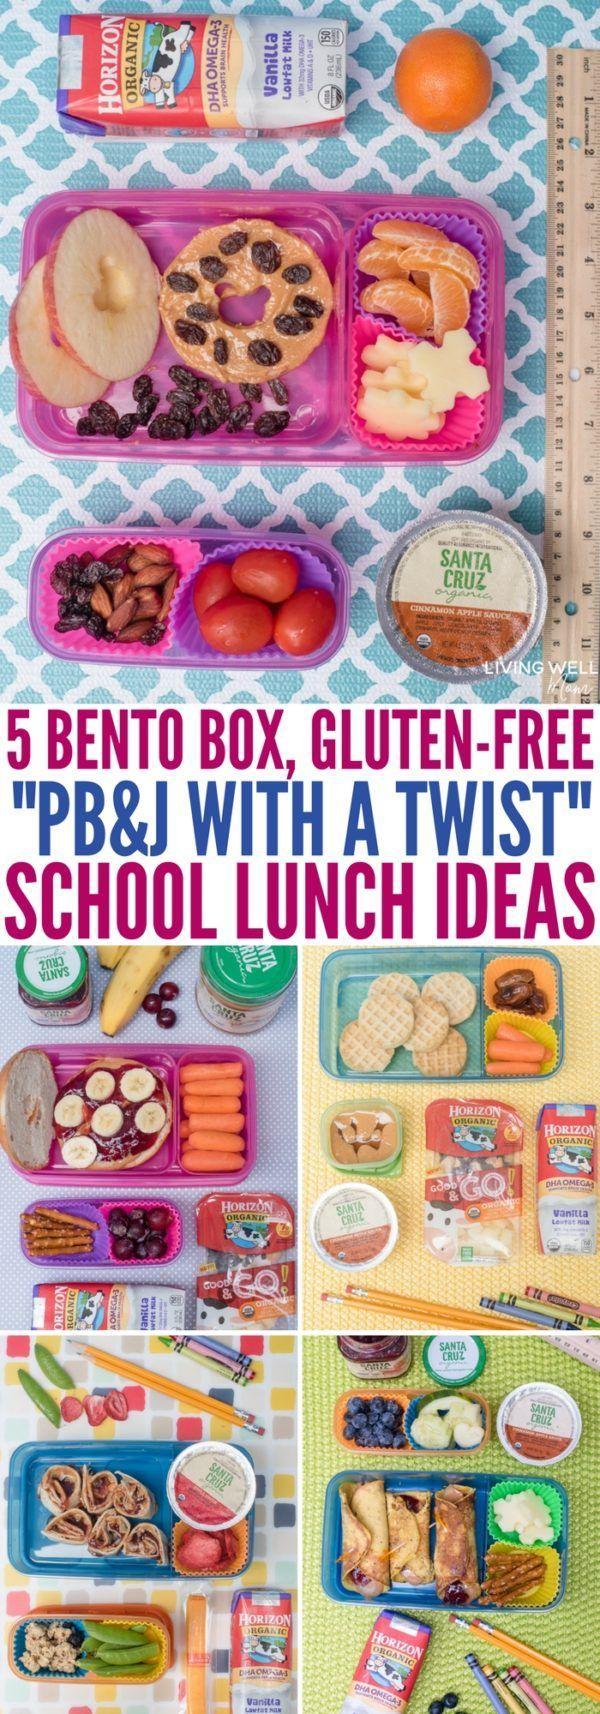 5 Gluten-Free Twists on Peanut Butter & Jelly Sandwiches for Kids